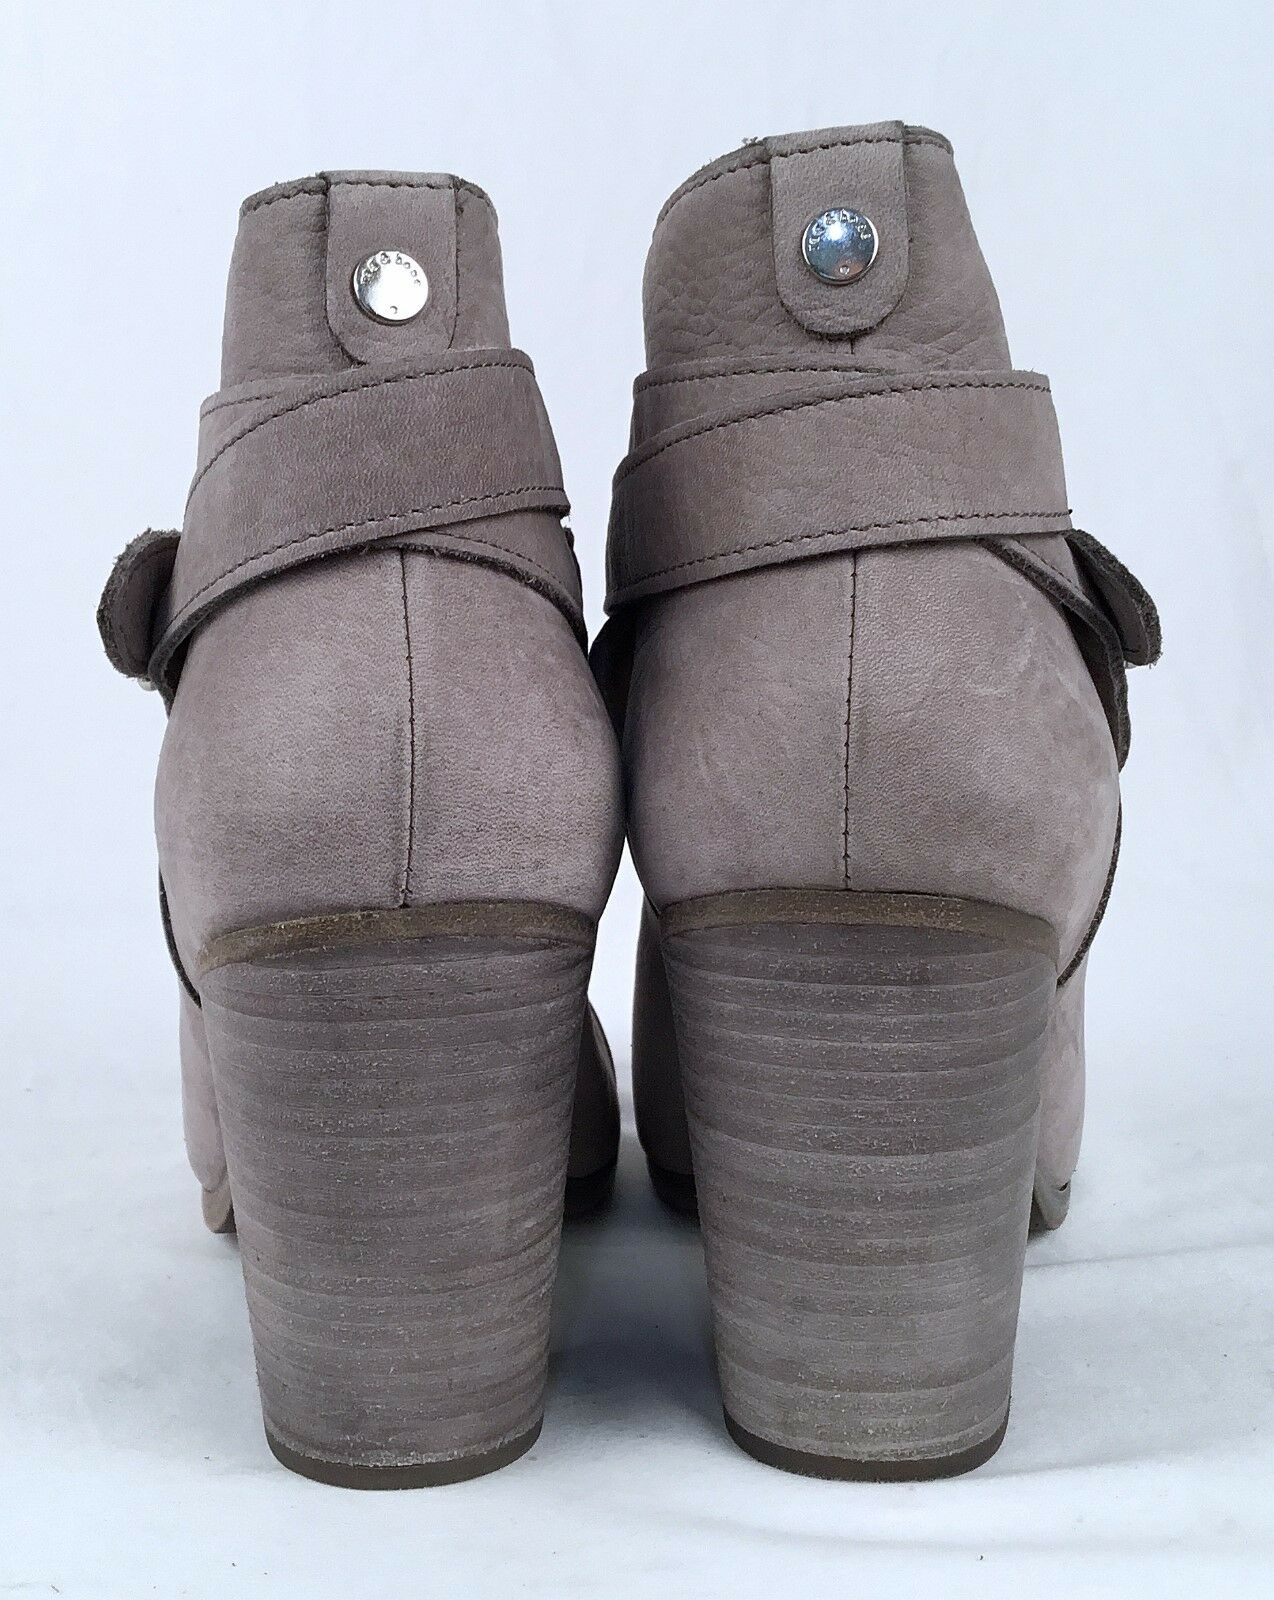 Rag Rag Rag & bone -'Harrow' Bootie- Grey - Nubuck- Size US 10.5  41 EU - 550  (P37) b6023a